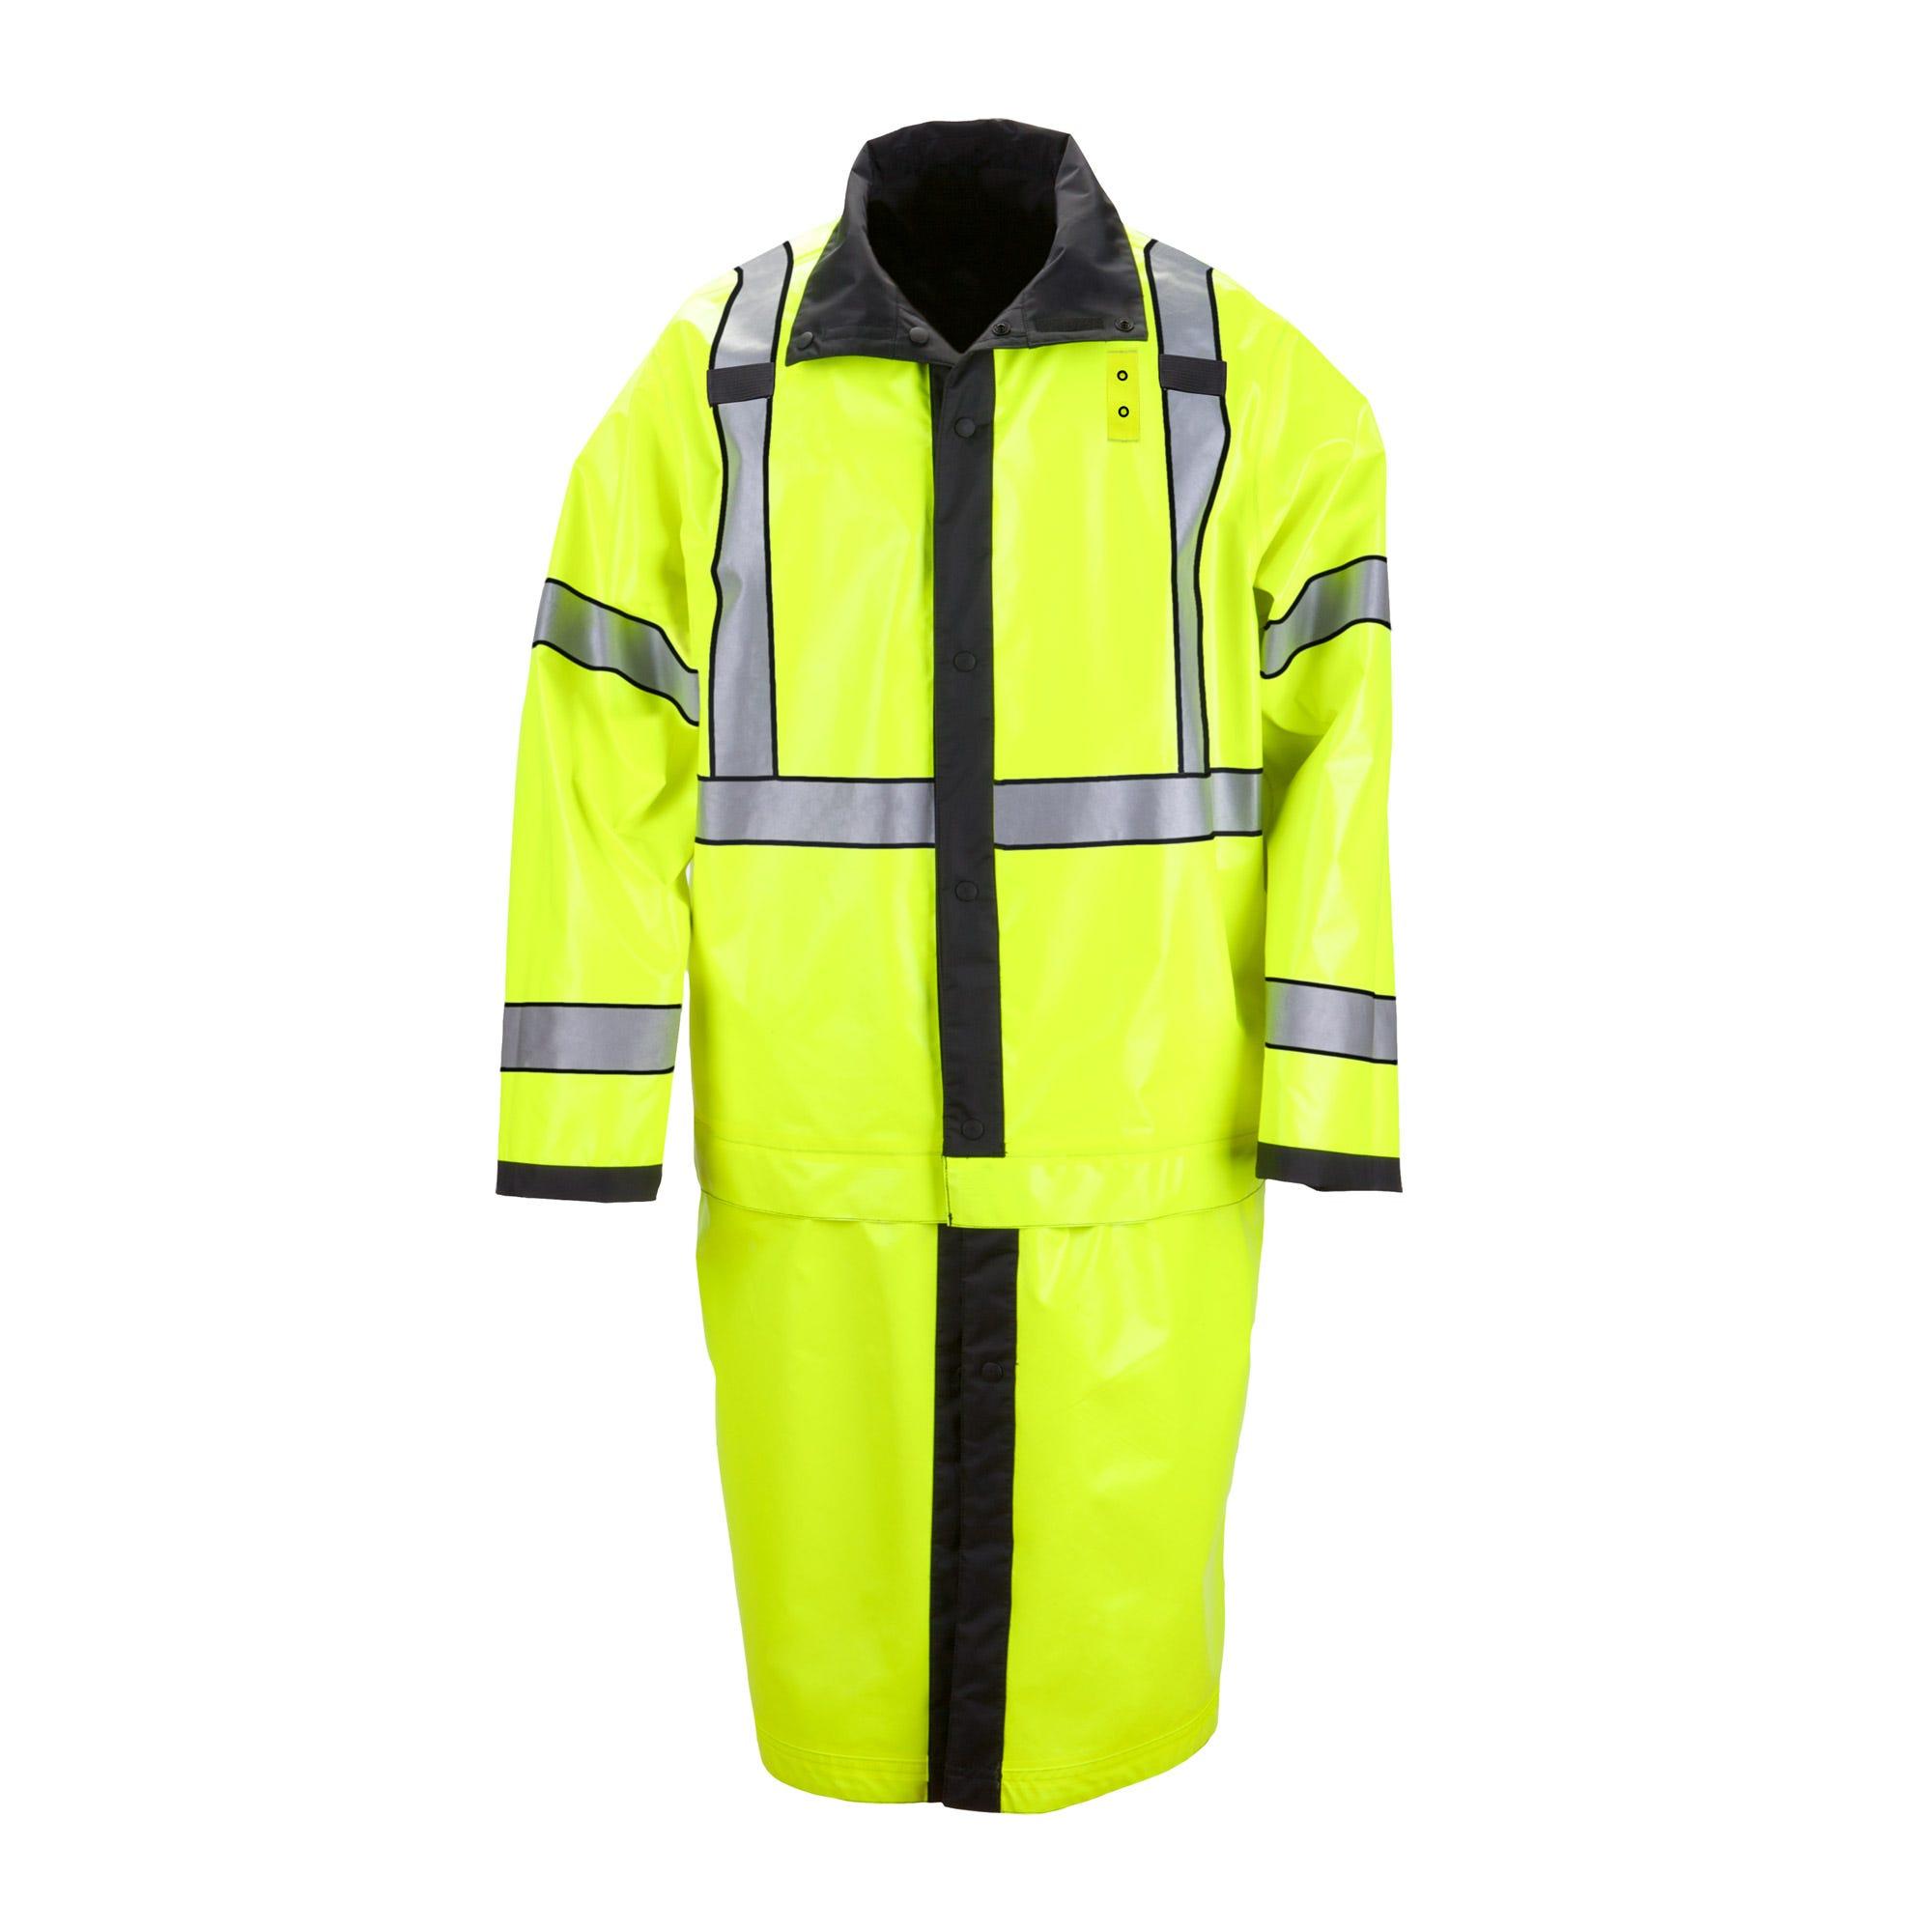 5.11 Tactical Men's Reversible Hi-Vis Rain Coat (Black)